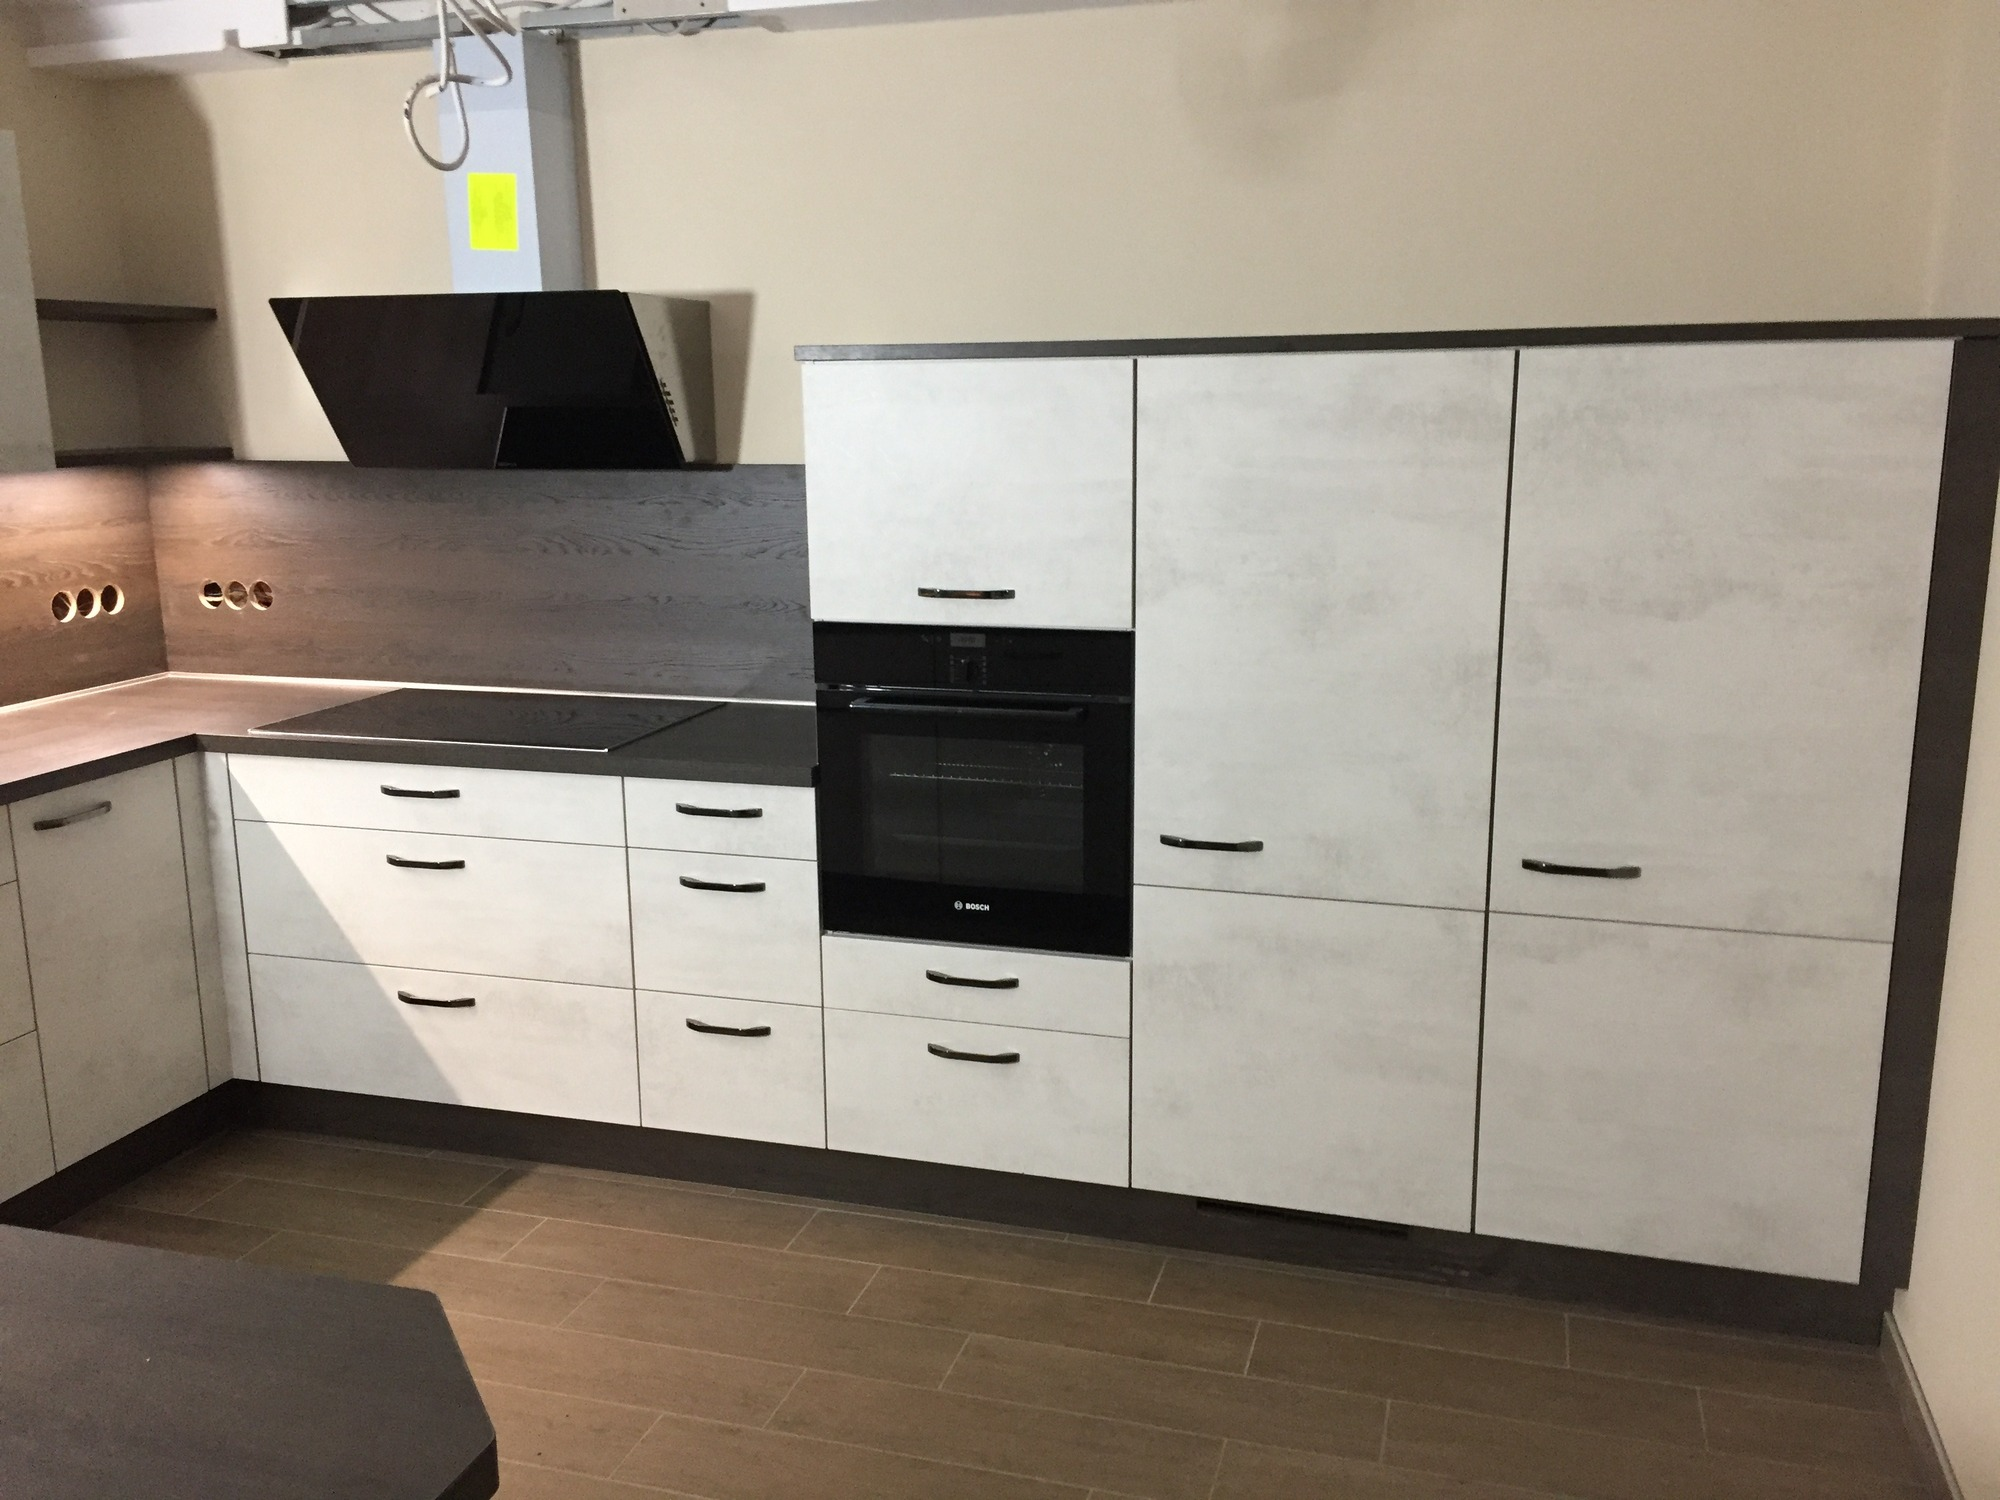 großzügige offene Küche in Betonoptik - Gutsmann Küchen ...